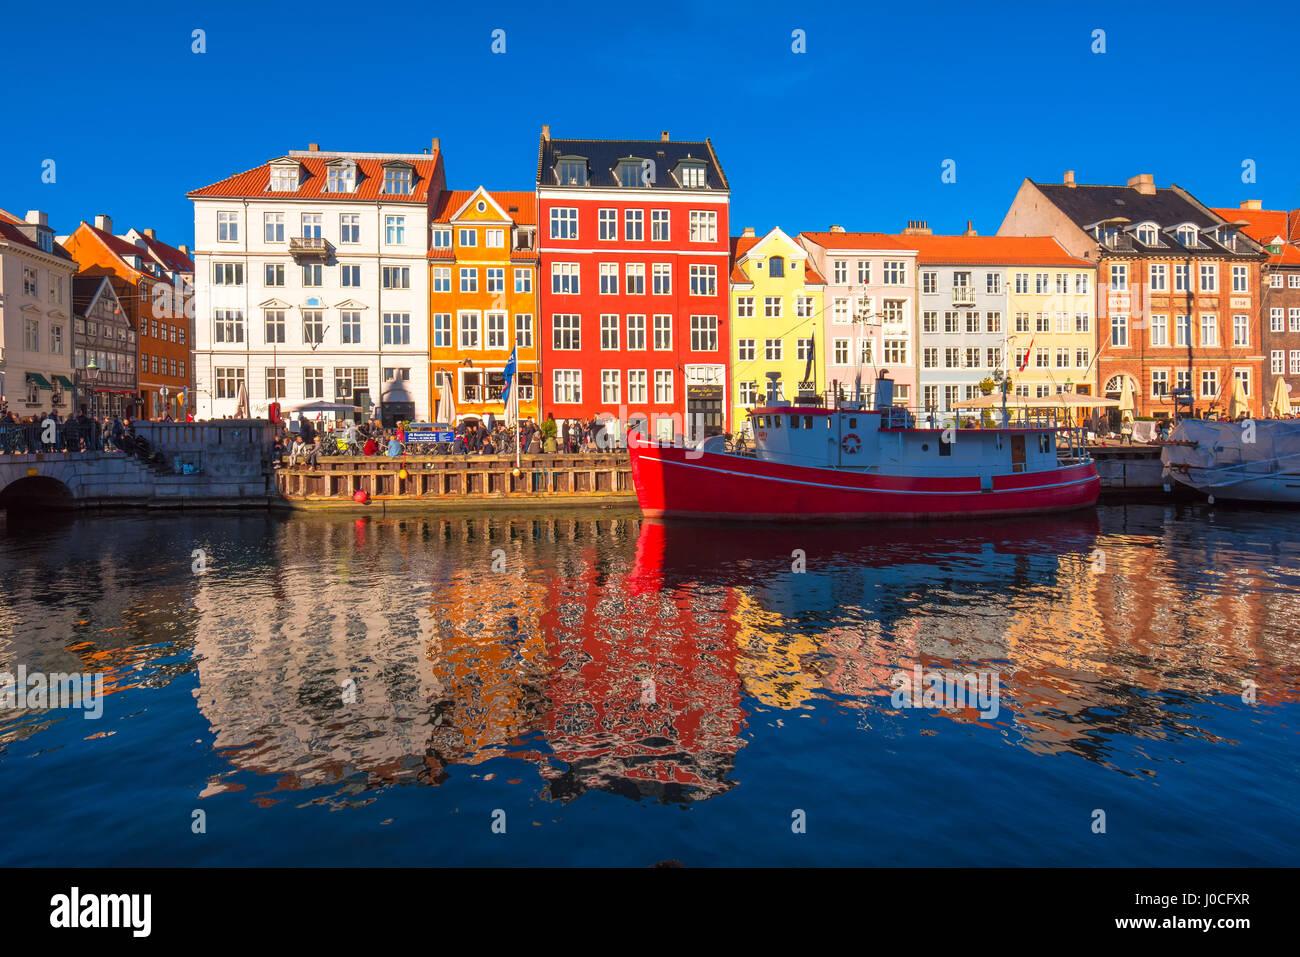 COPENHAGEN, DENMARK - MARCH 11, 2017: Copenhagen Nyhavn district. Nyhavn was constructed by King Christian V from - Stock Image